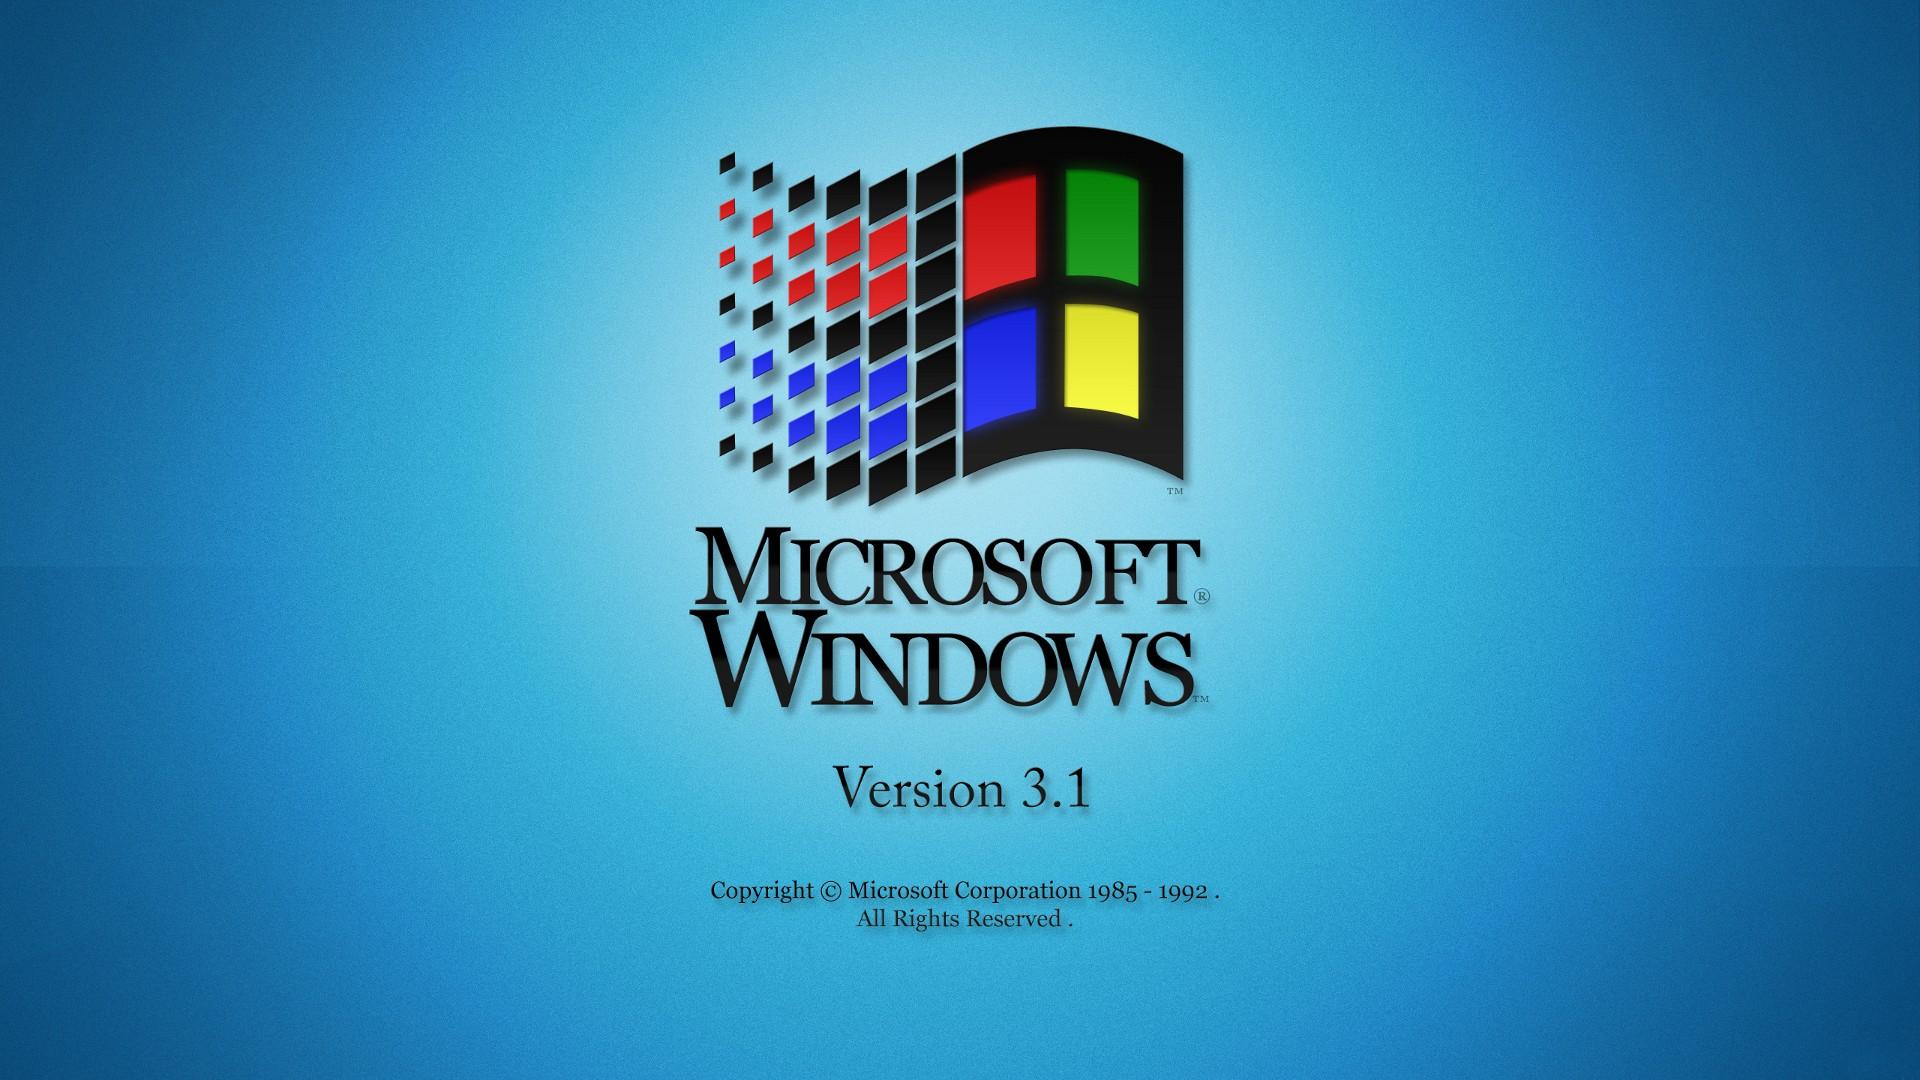 Windows 98 Wallpaper Download Free Amazing Hd